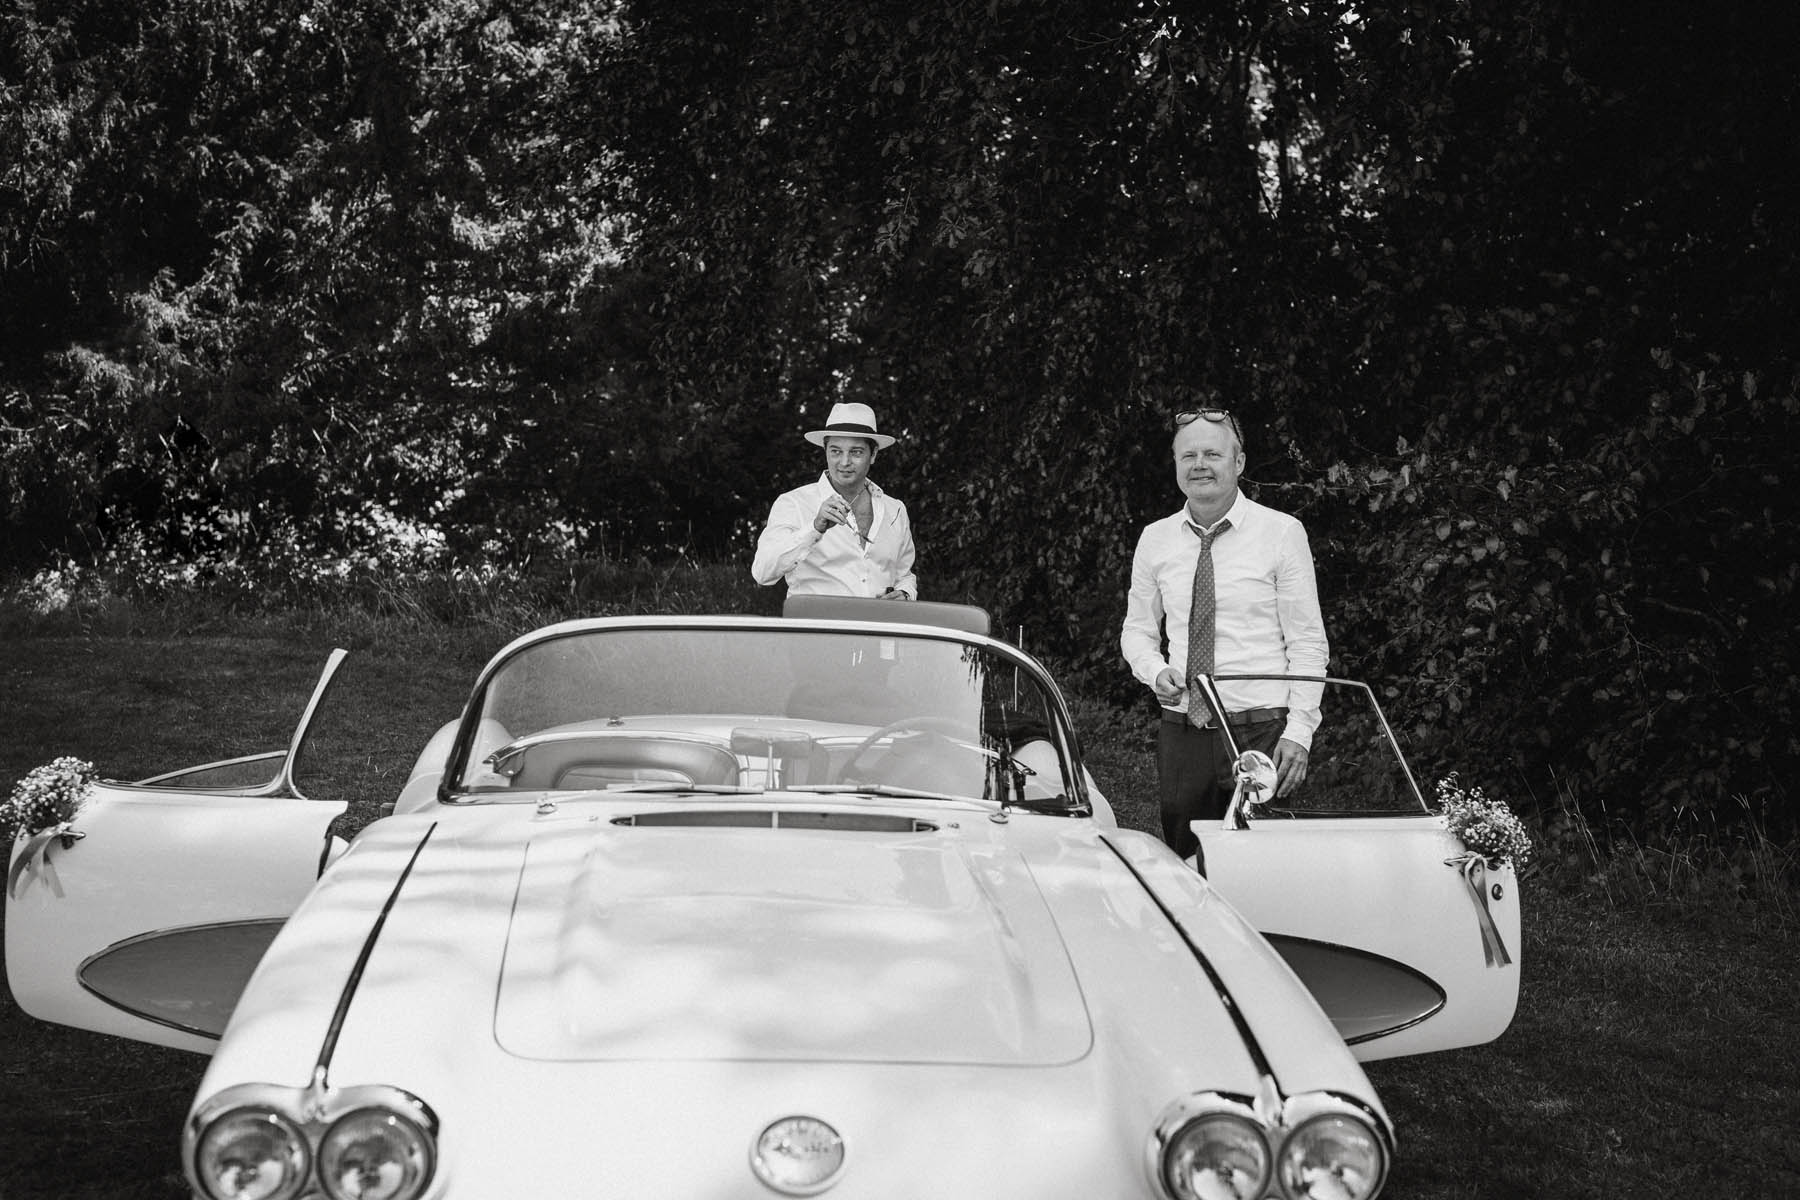 raissa simon fotografie hochzeit vintage starnberger see la villa 045 - Patricia + Maximilian